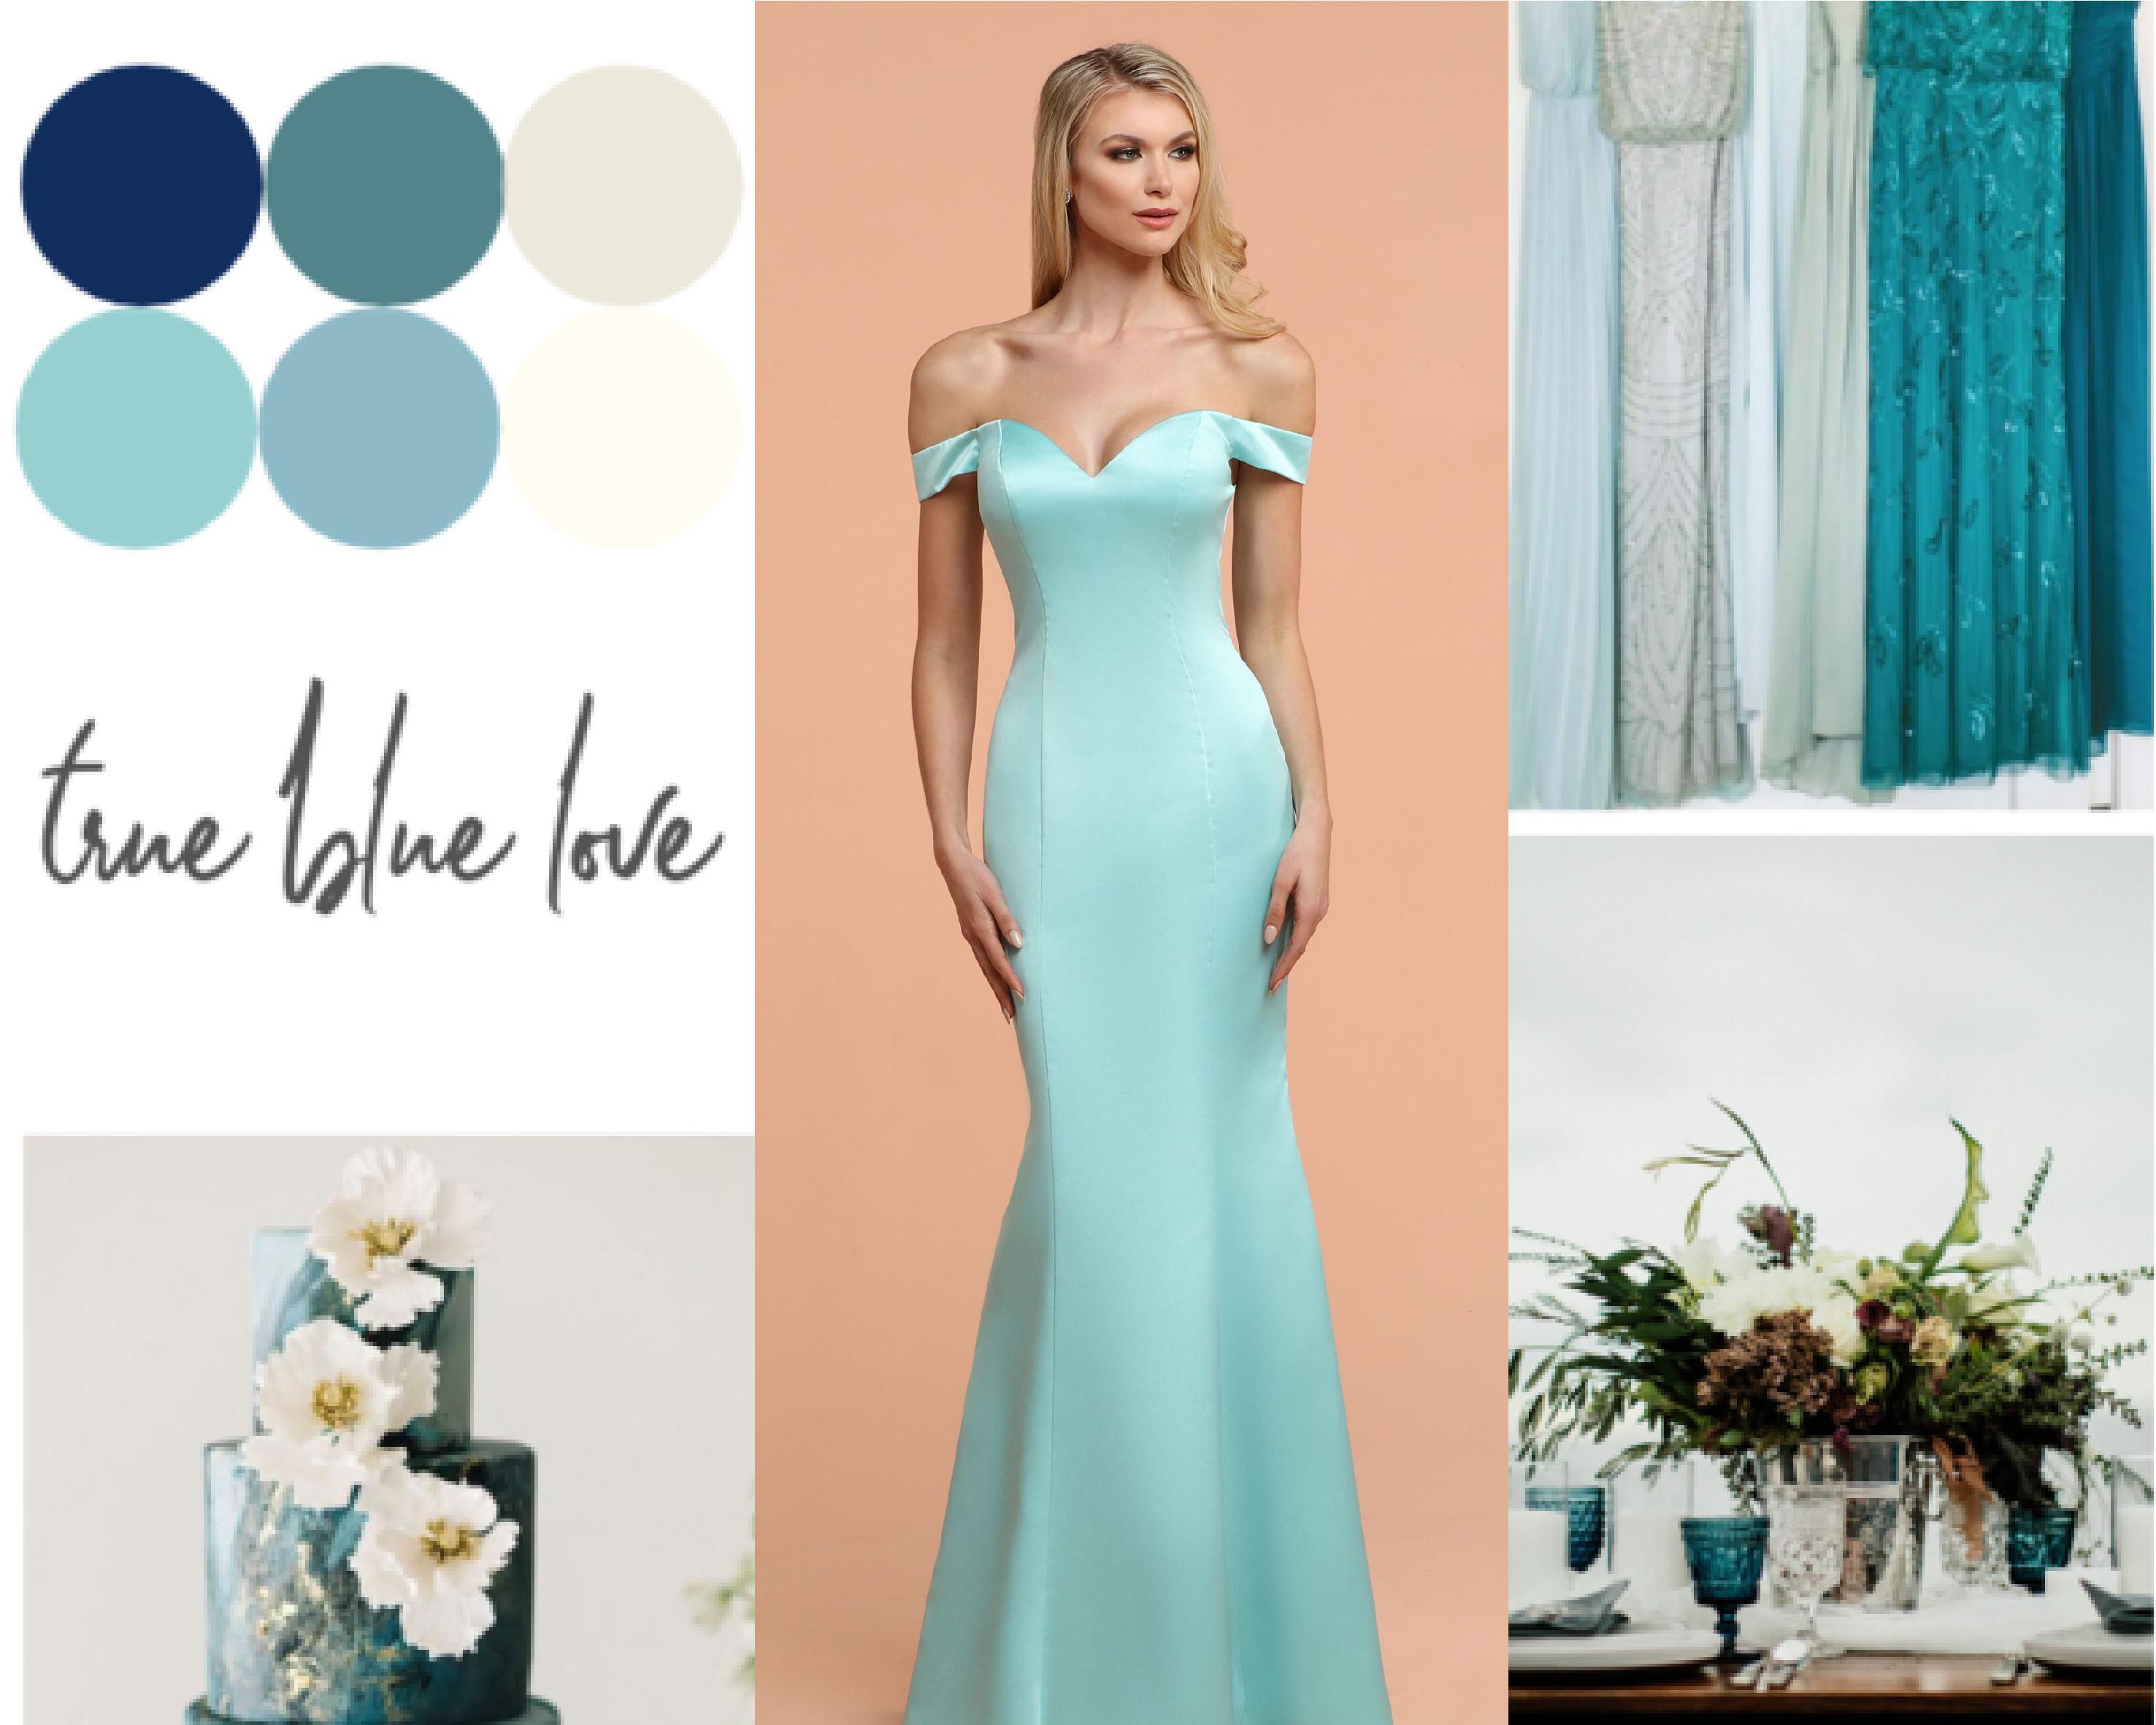 2020 Bridesmaid Dresses Color Trends Blue Davinci Bridal,Used Wedding Dress For Sale